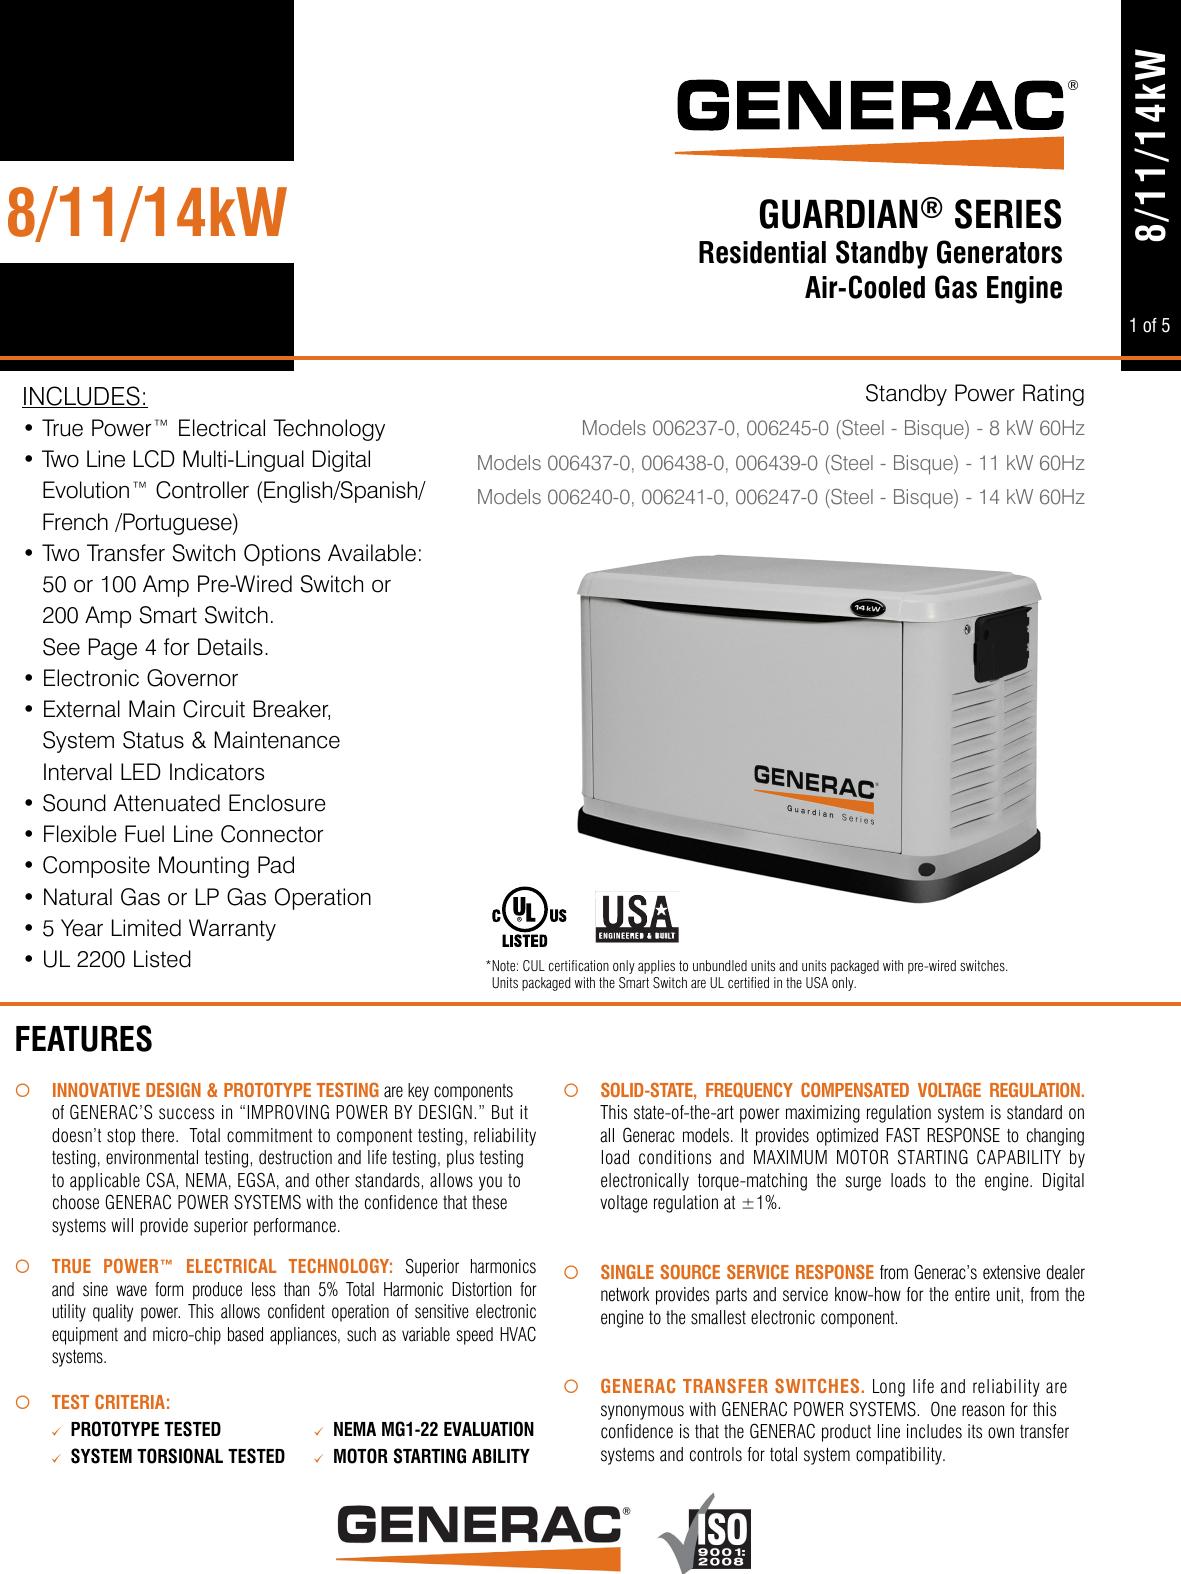 64376 3 Generac 6245 Product Specs